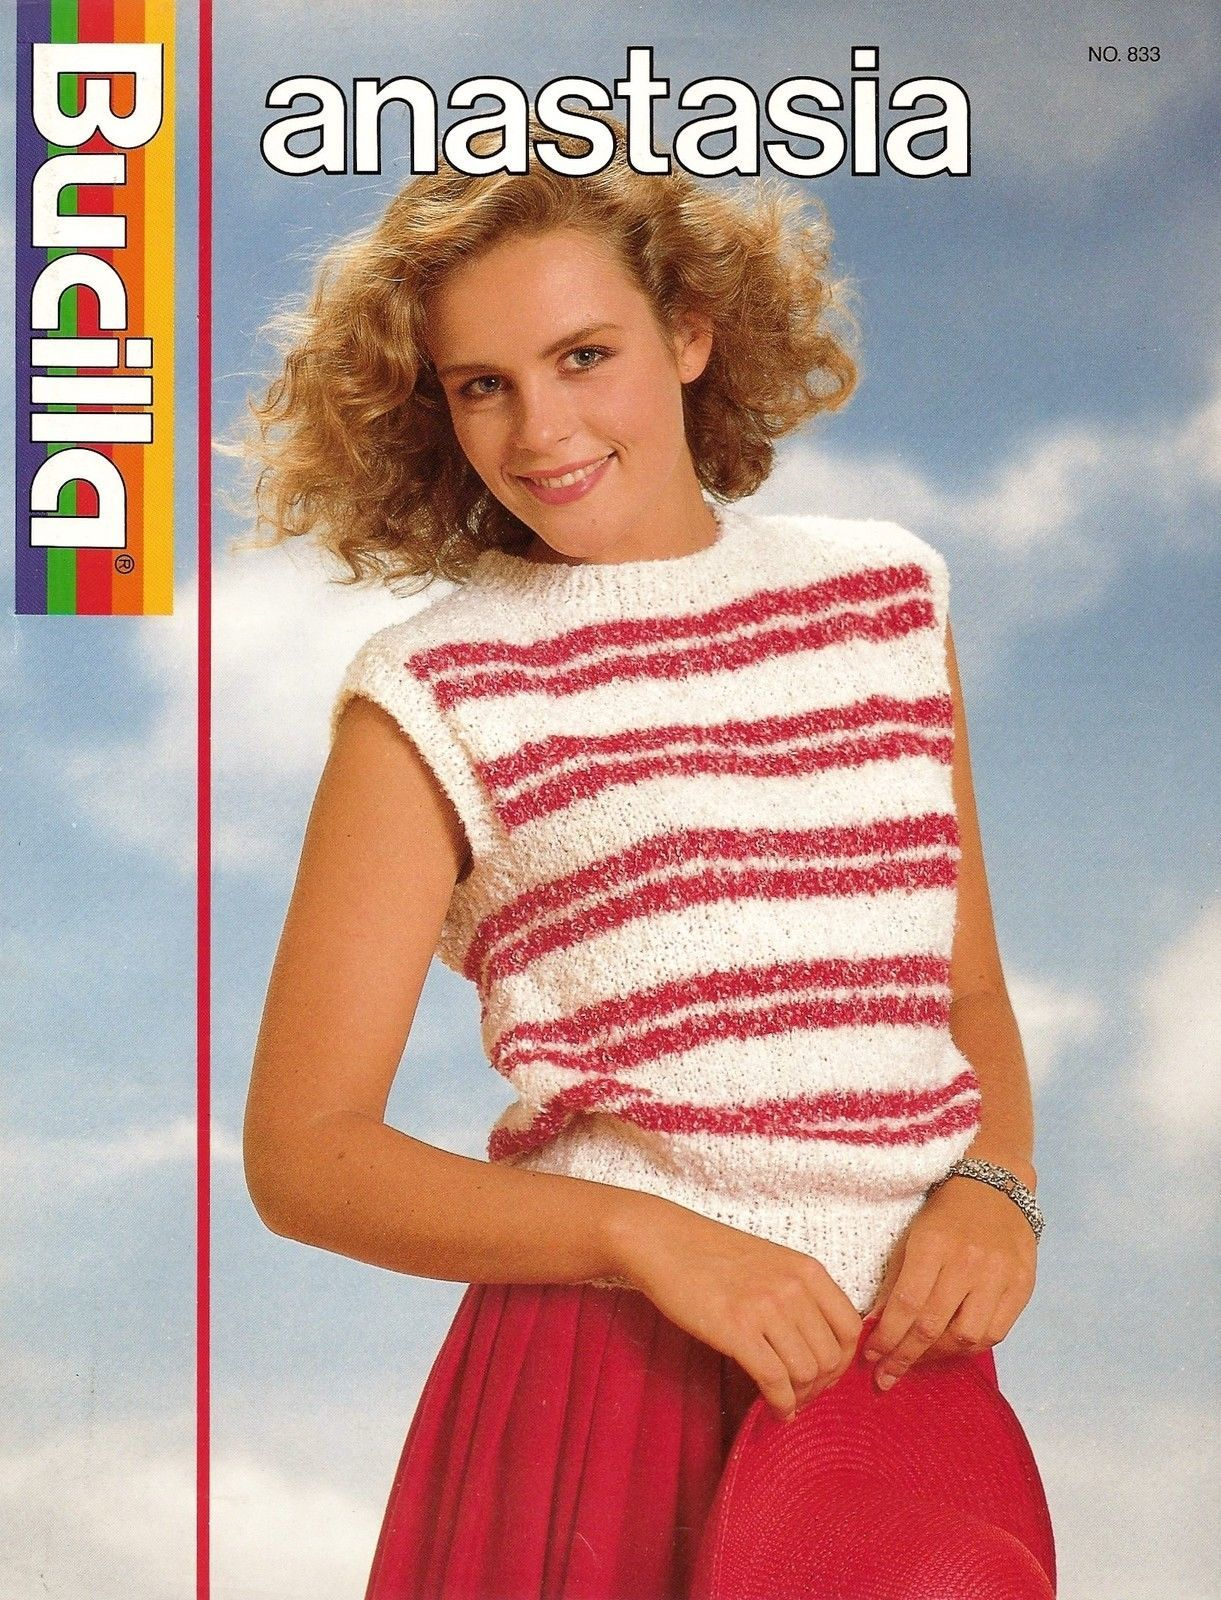 15 Bucilla Knitting Patterns - Women\'s and 44 similar items